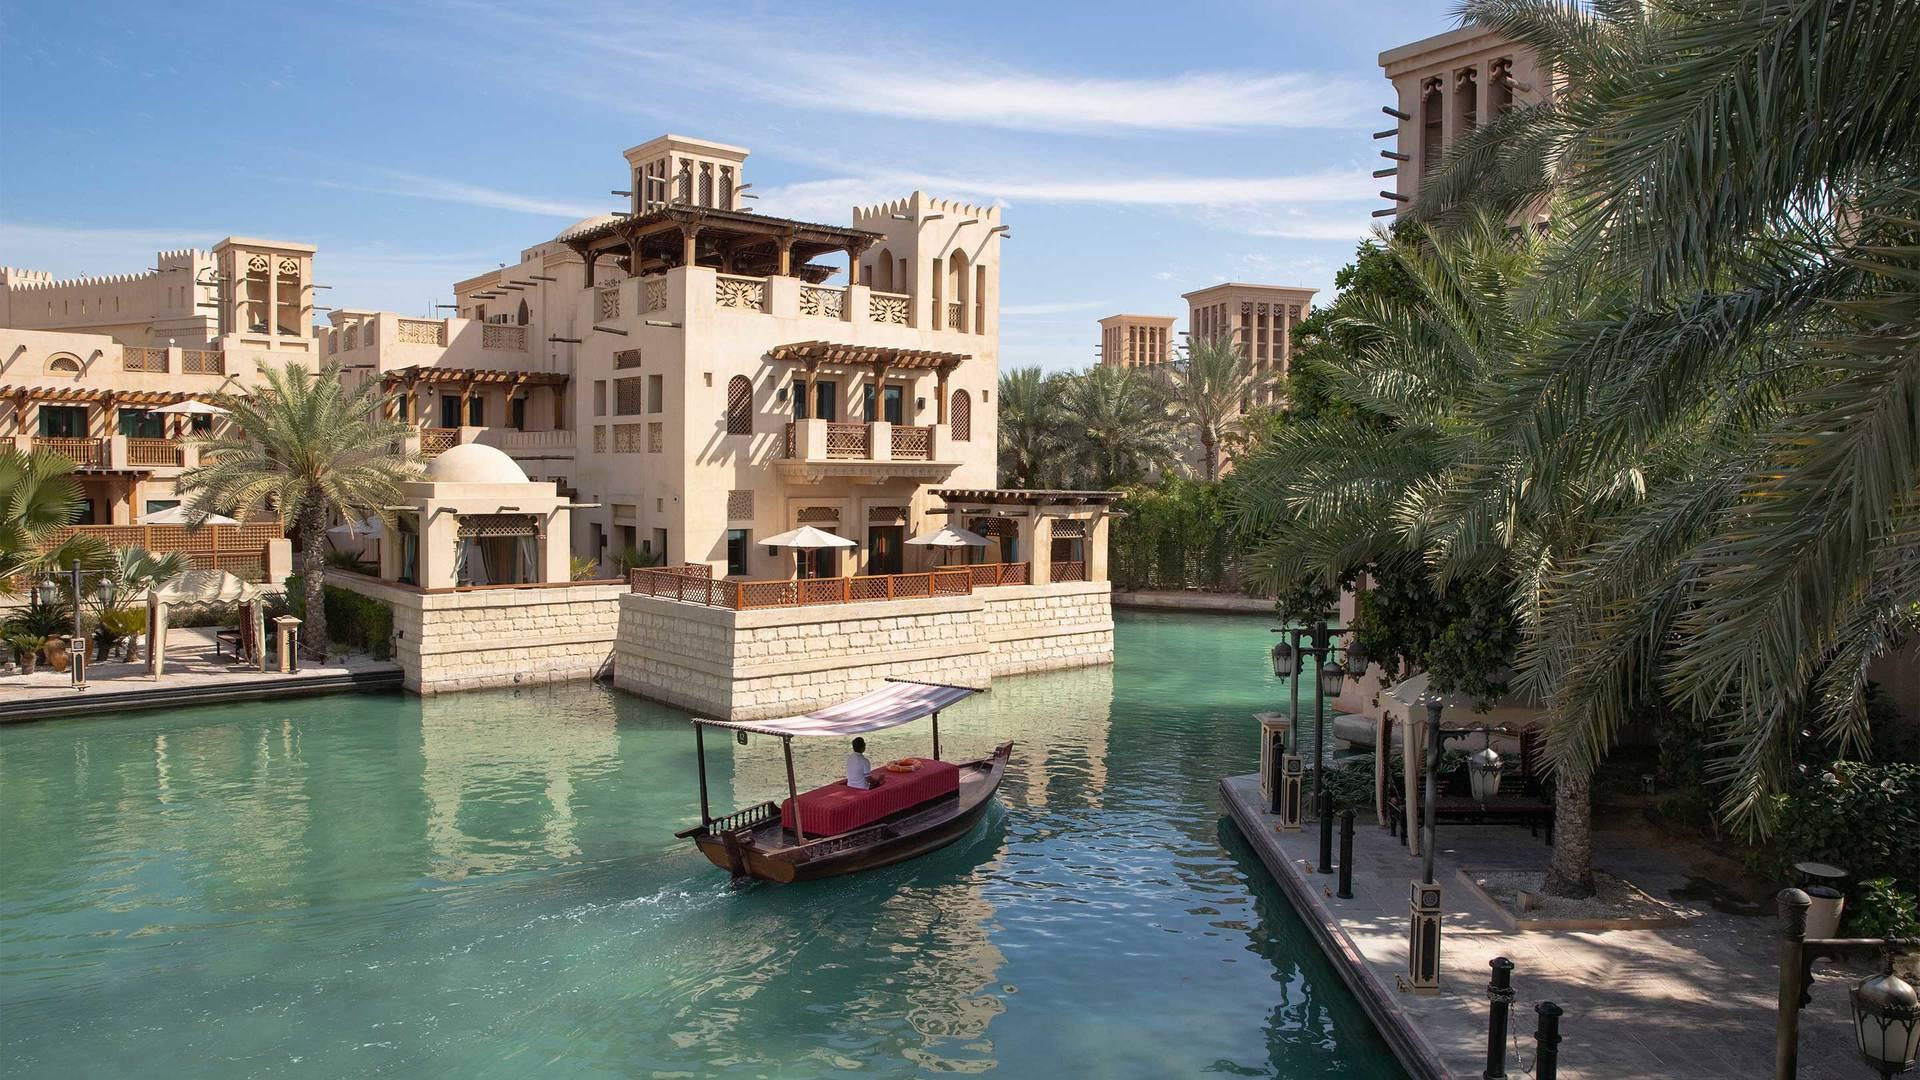 16-9 Предложение отеля Jumeirah Mina A'Salam на курорте Madinat — номер люкс Madinat